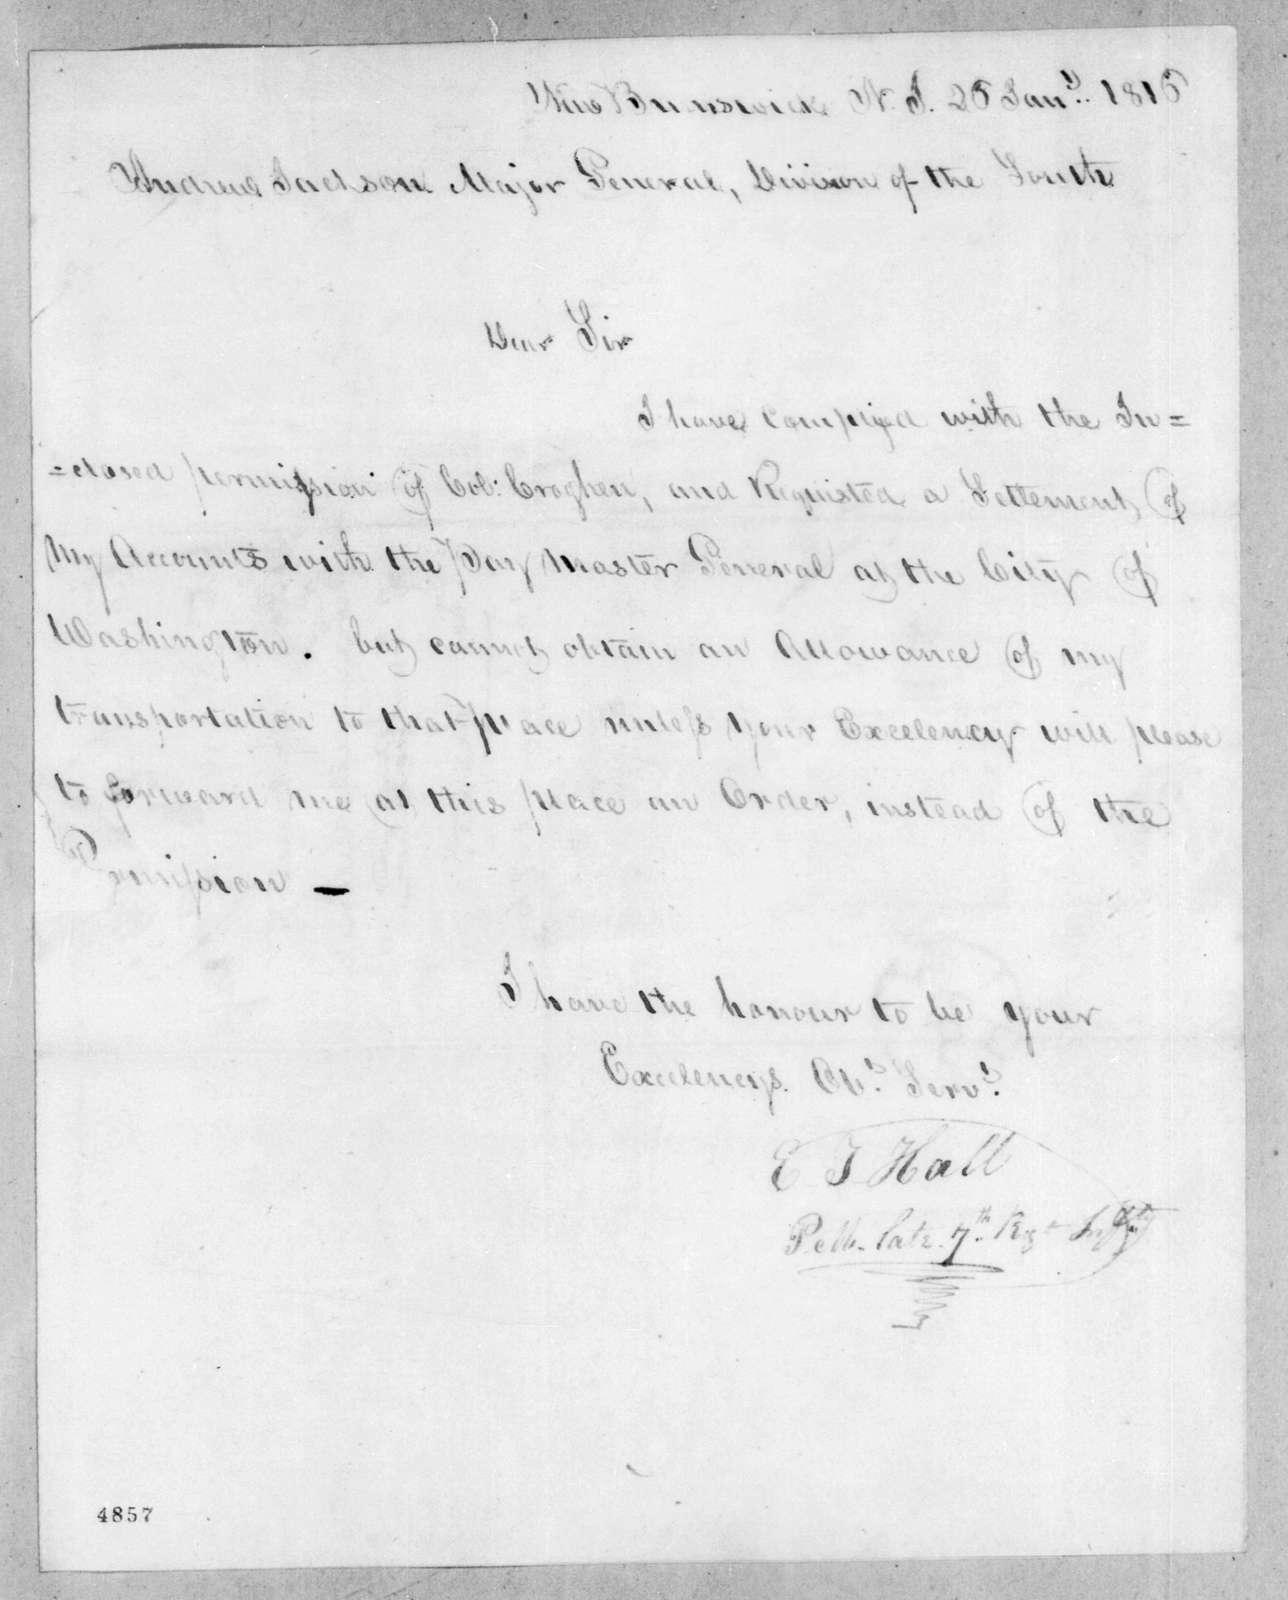 Elisha T. Hall to Andrew Jackson, January 26, 1816